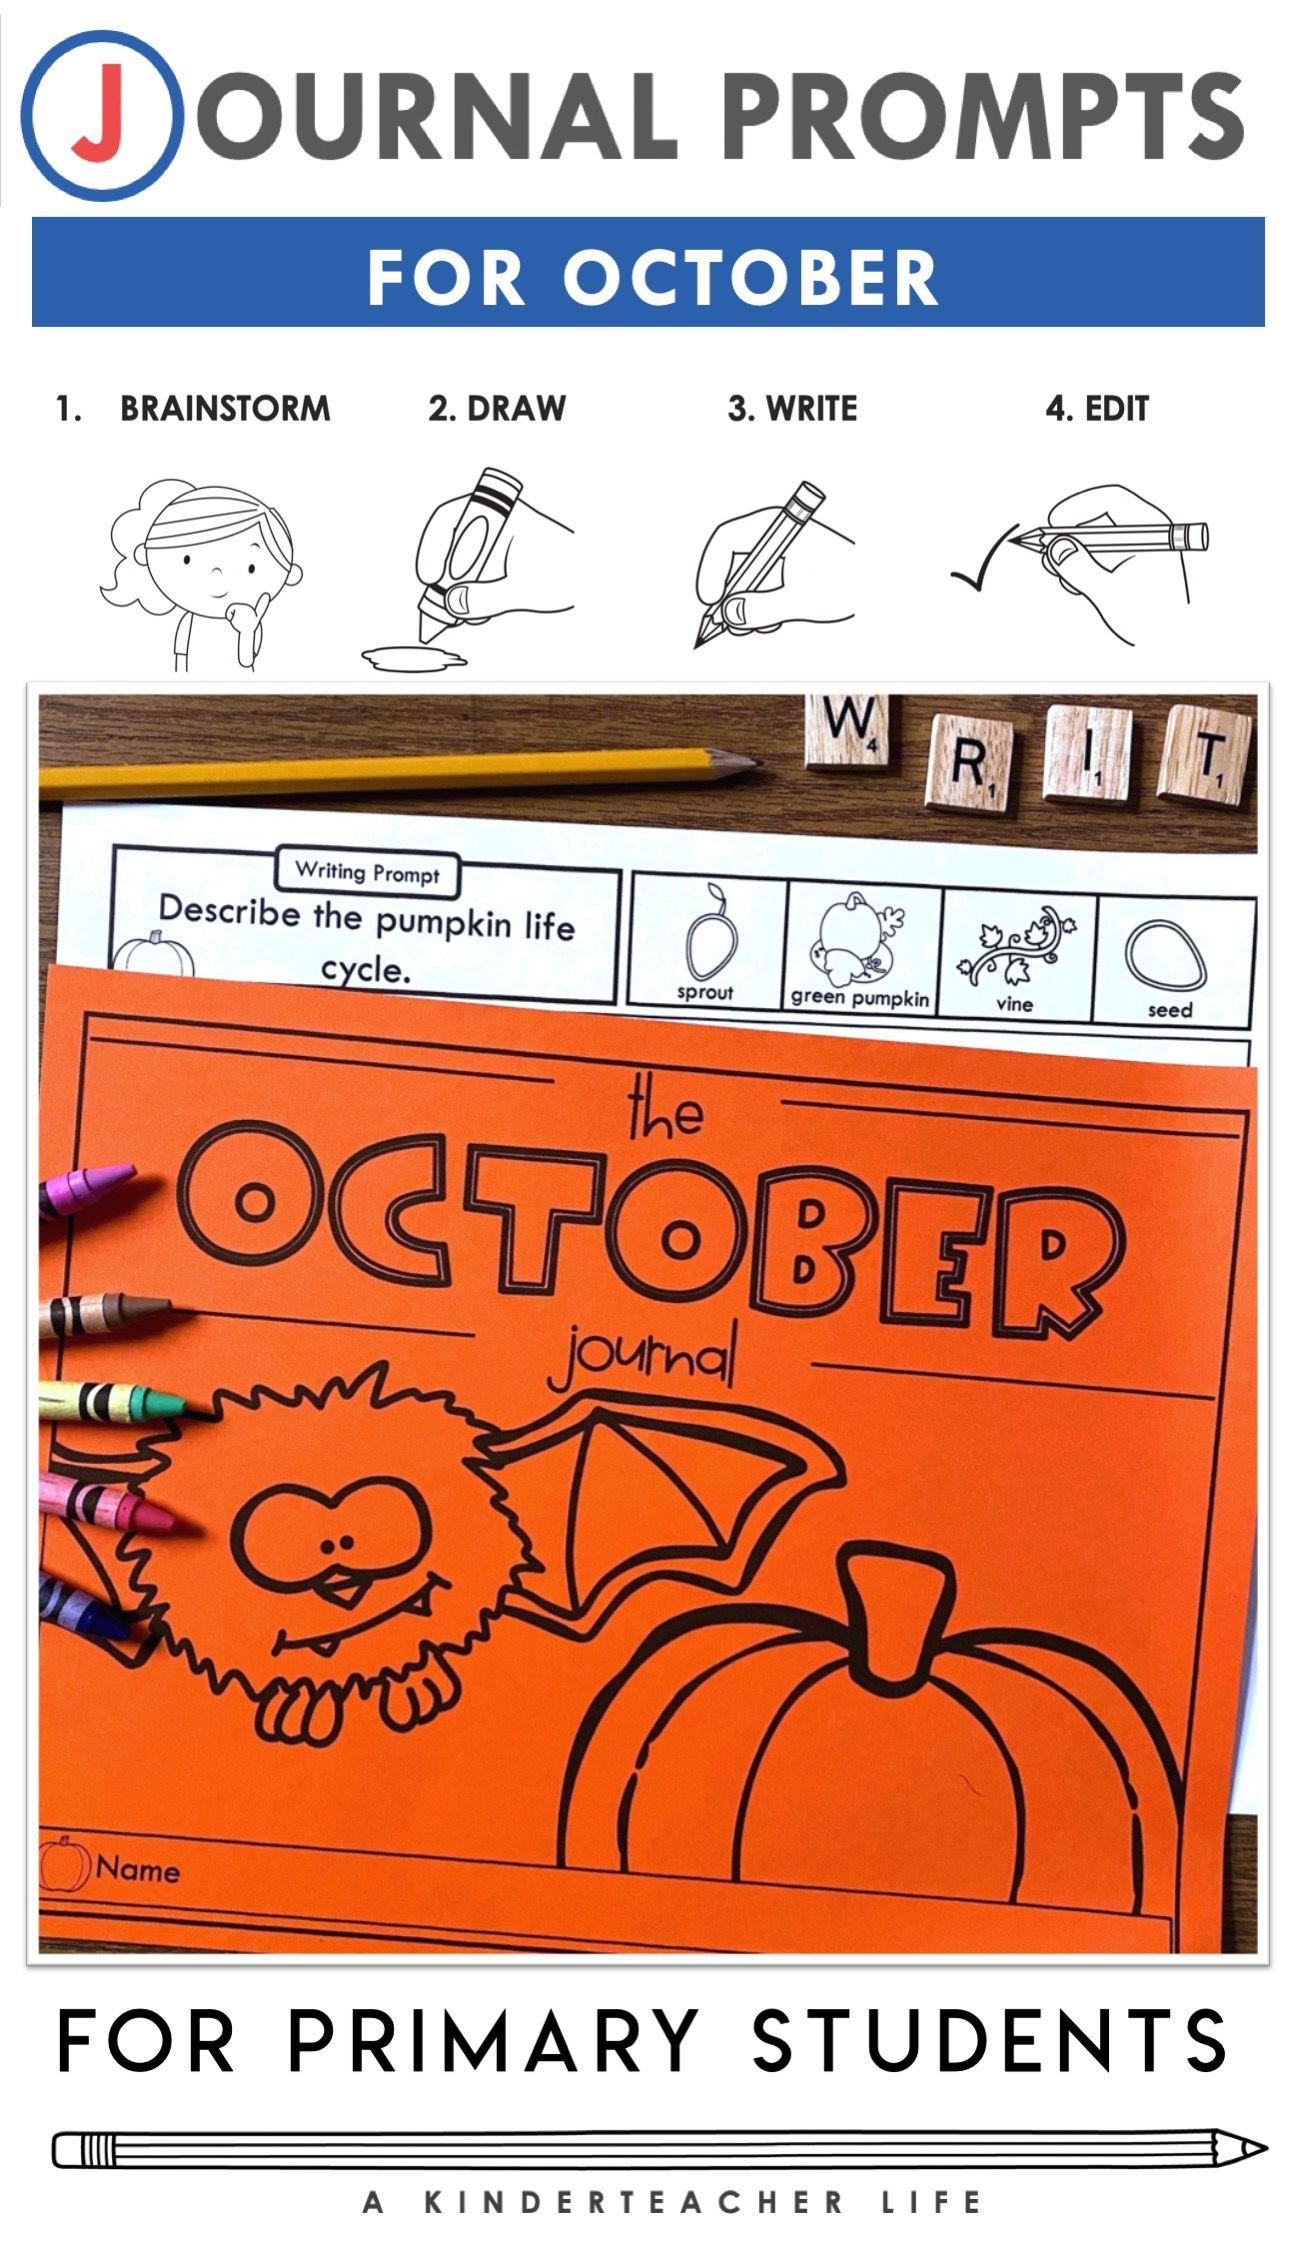 October Journal Prompts